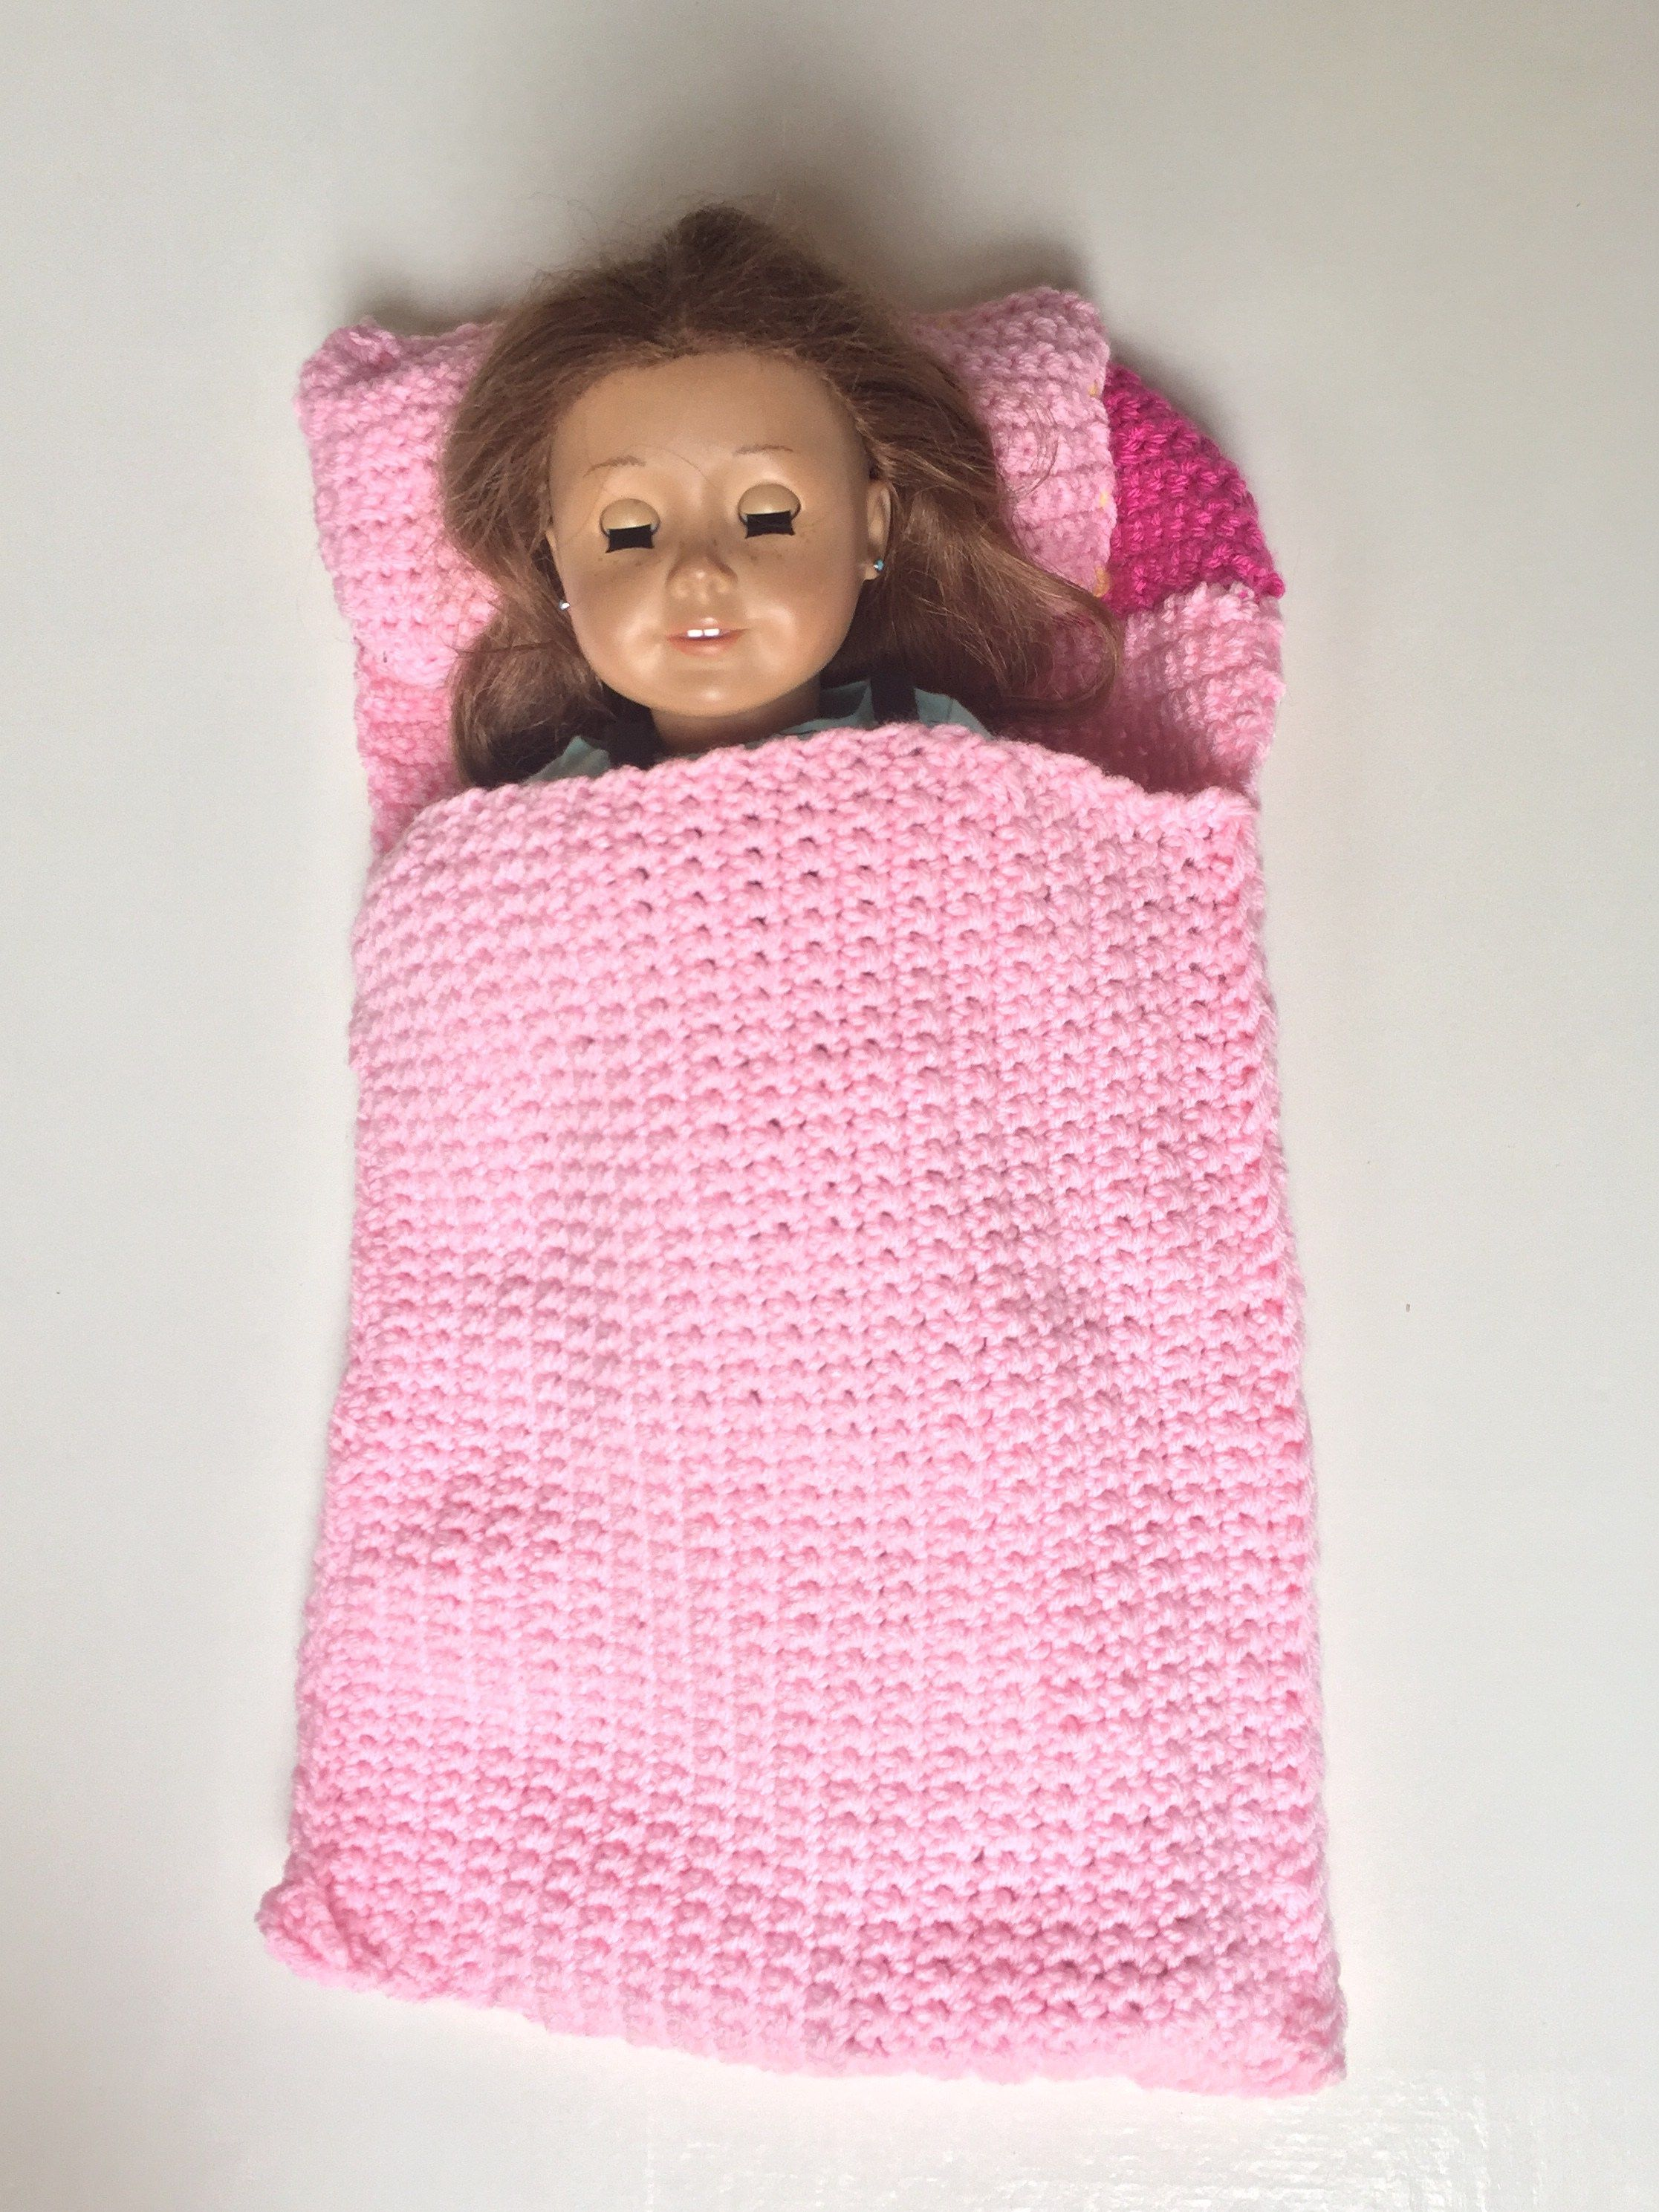 how to dress baby for sleep without sleep sack